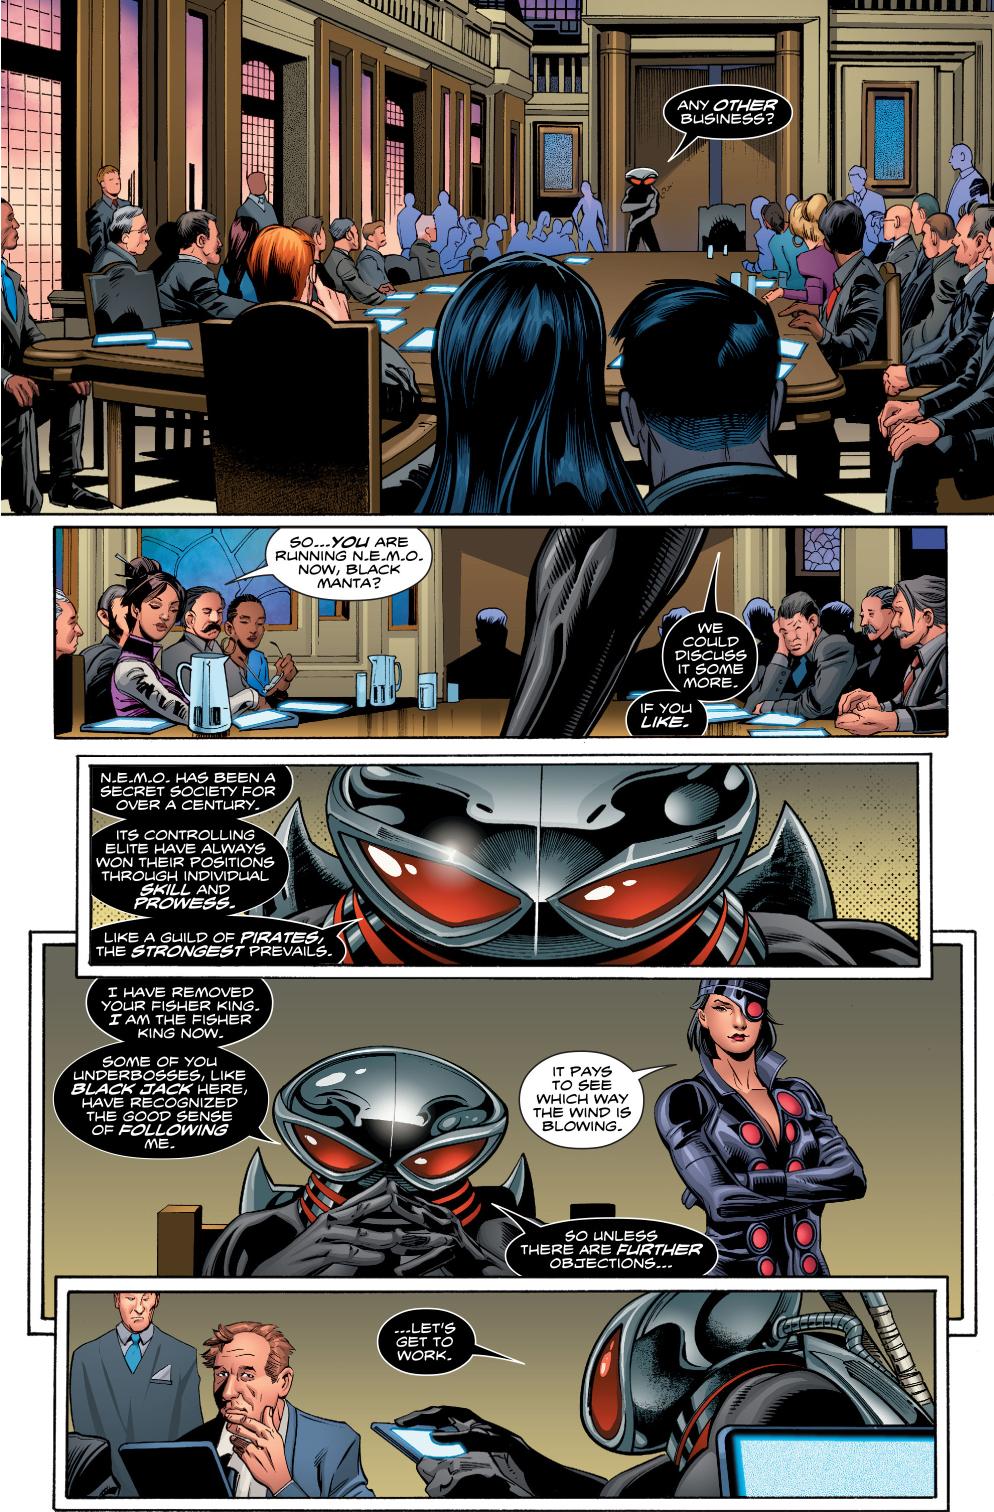 black-mantas-first-board-meeting-with-n-e-m-o